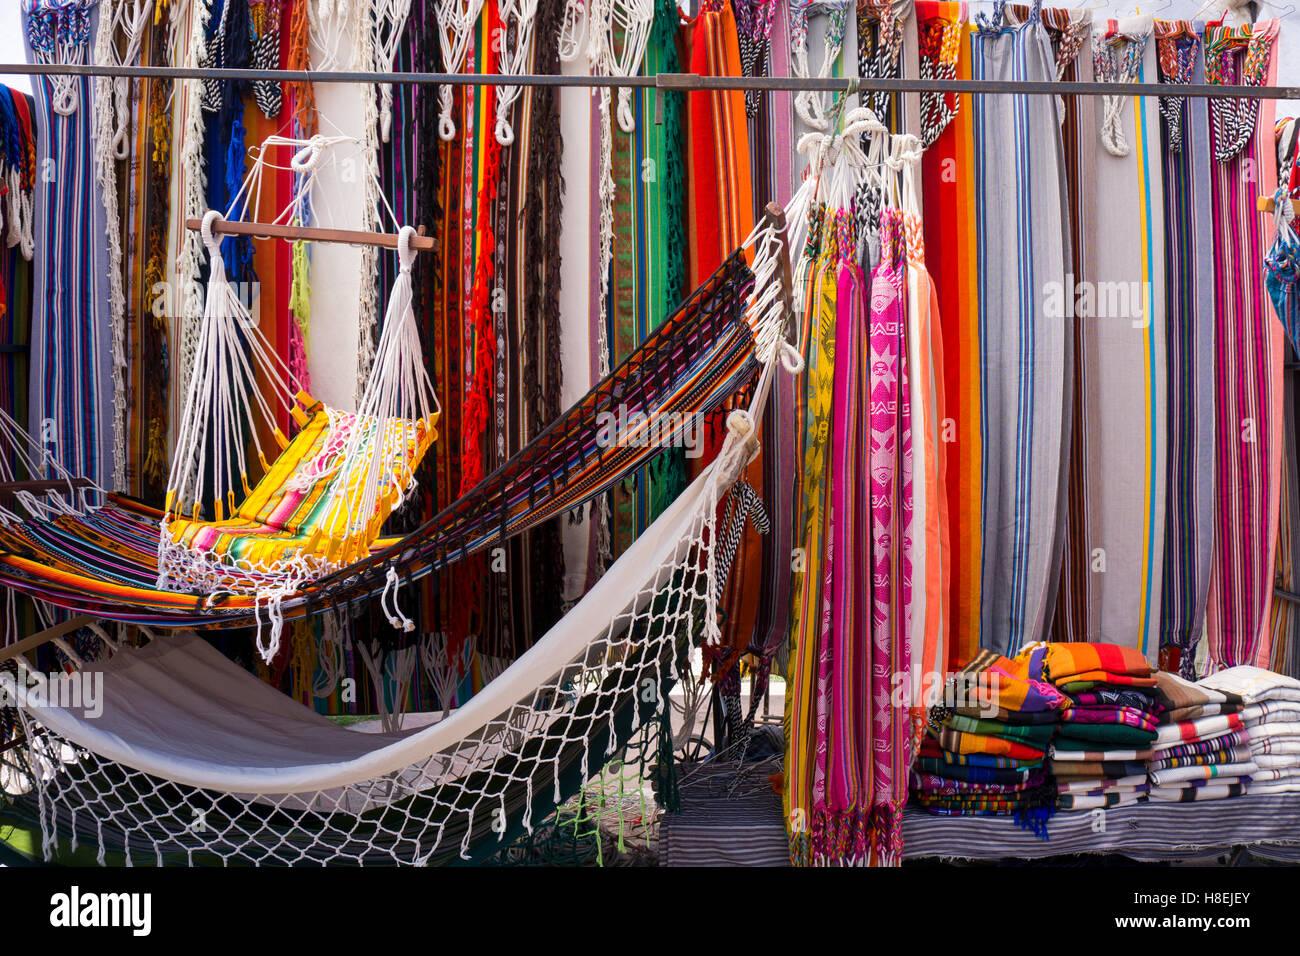 Hammocks for sale, Otovalo craft market, Otovalo, Ecuador, South America - Stock Image